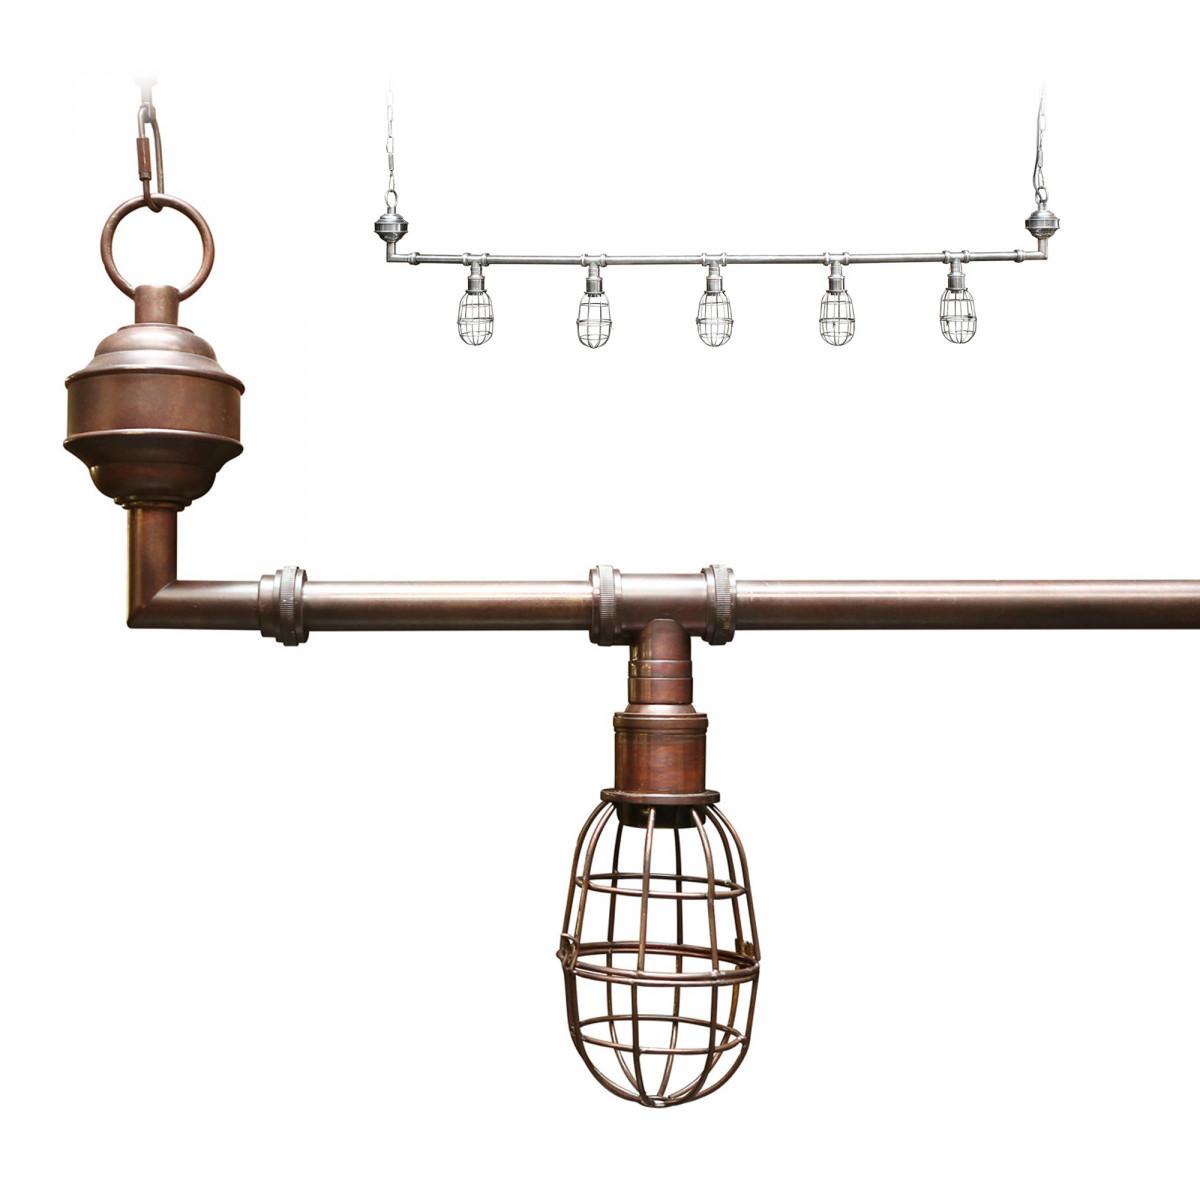 Industriële hanglamp Sandford antique dark brass 5-lights | Nostalux.nl